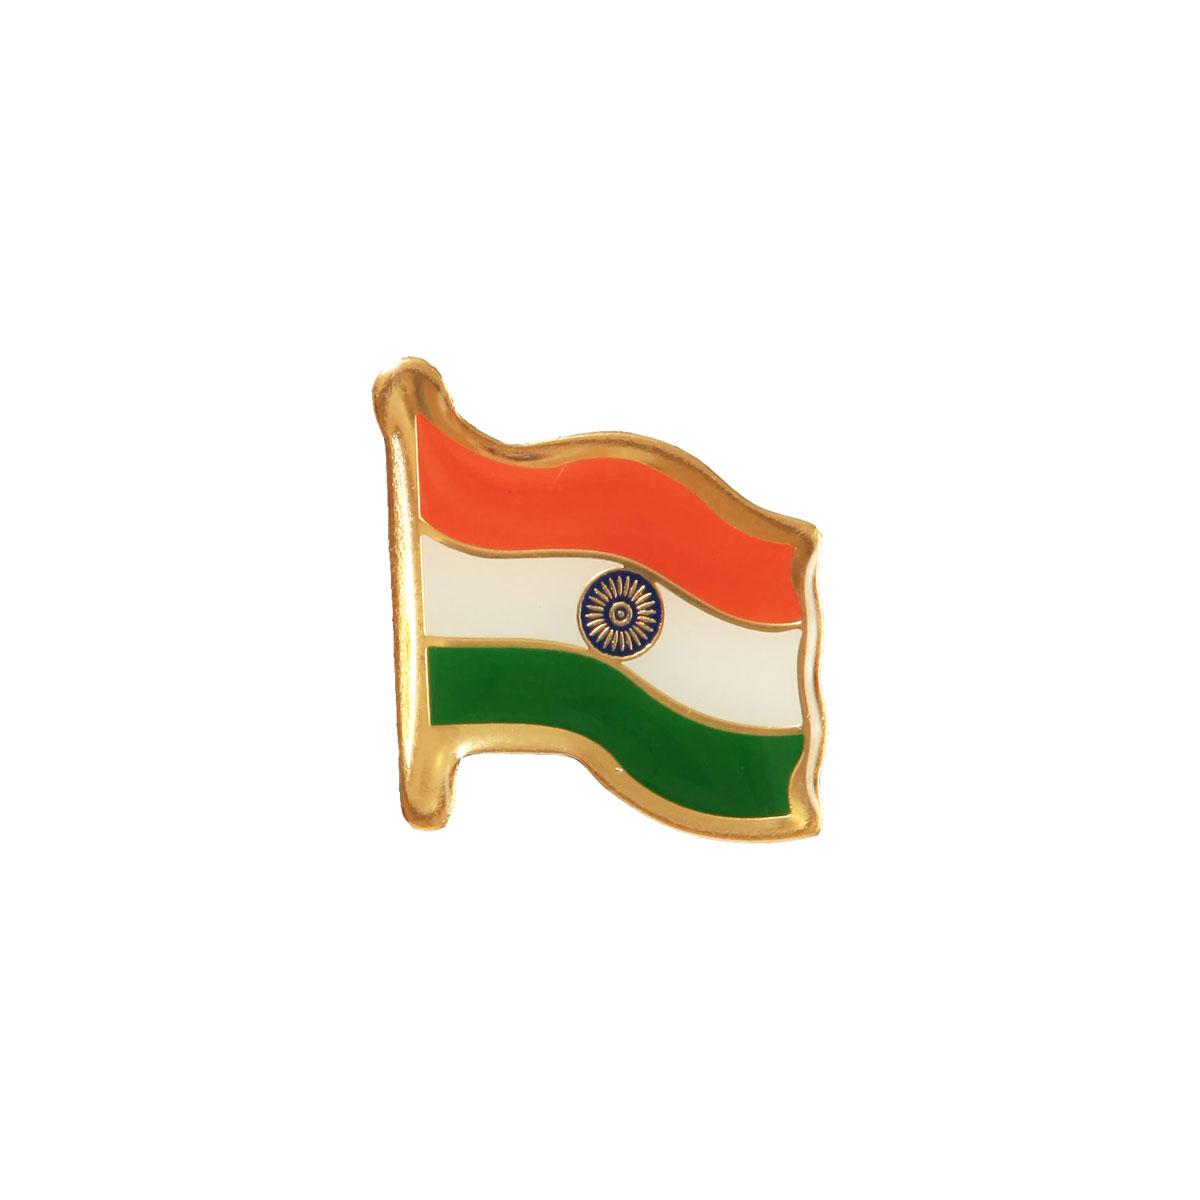 Indian Flag Brass Lapel Pin / Brooch / Badge - Medium Size